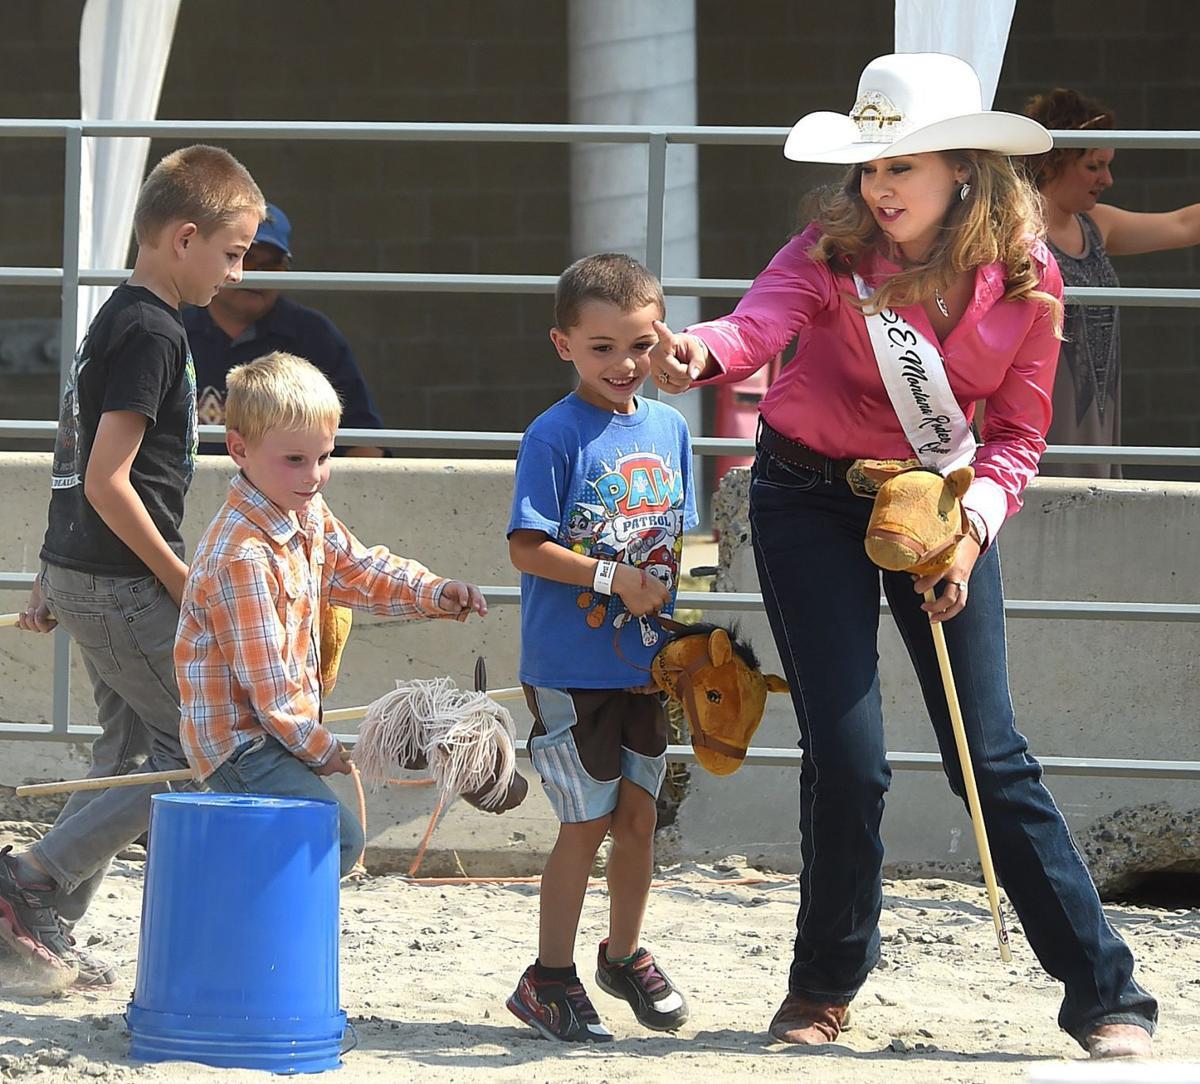 Børn Konkurrer I Stick Horse Rodeo Hos Montanafair Lokal Billingsgazettecom-9661